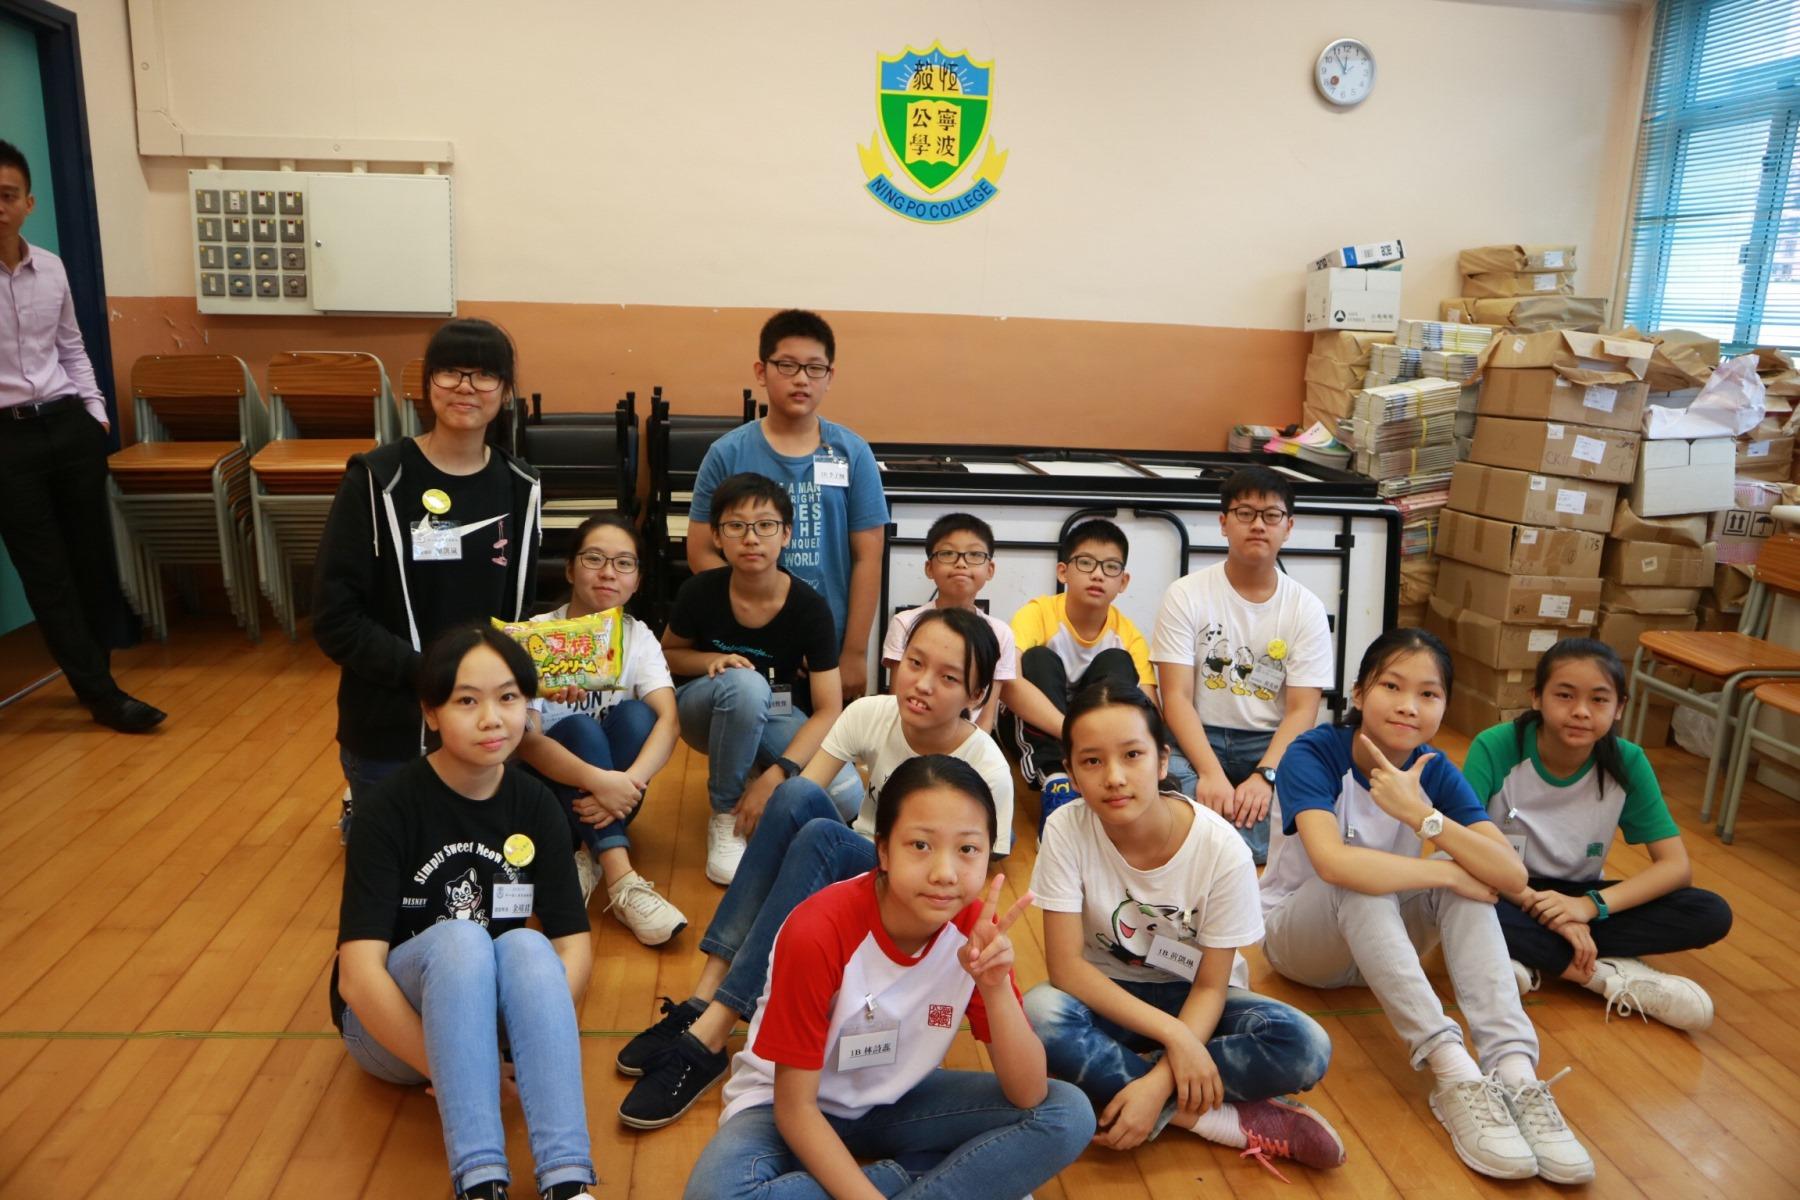 http://npc.edu.hk/sites/default/files/1b_zhong_zhi_cheng_cheng_04.jpg